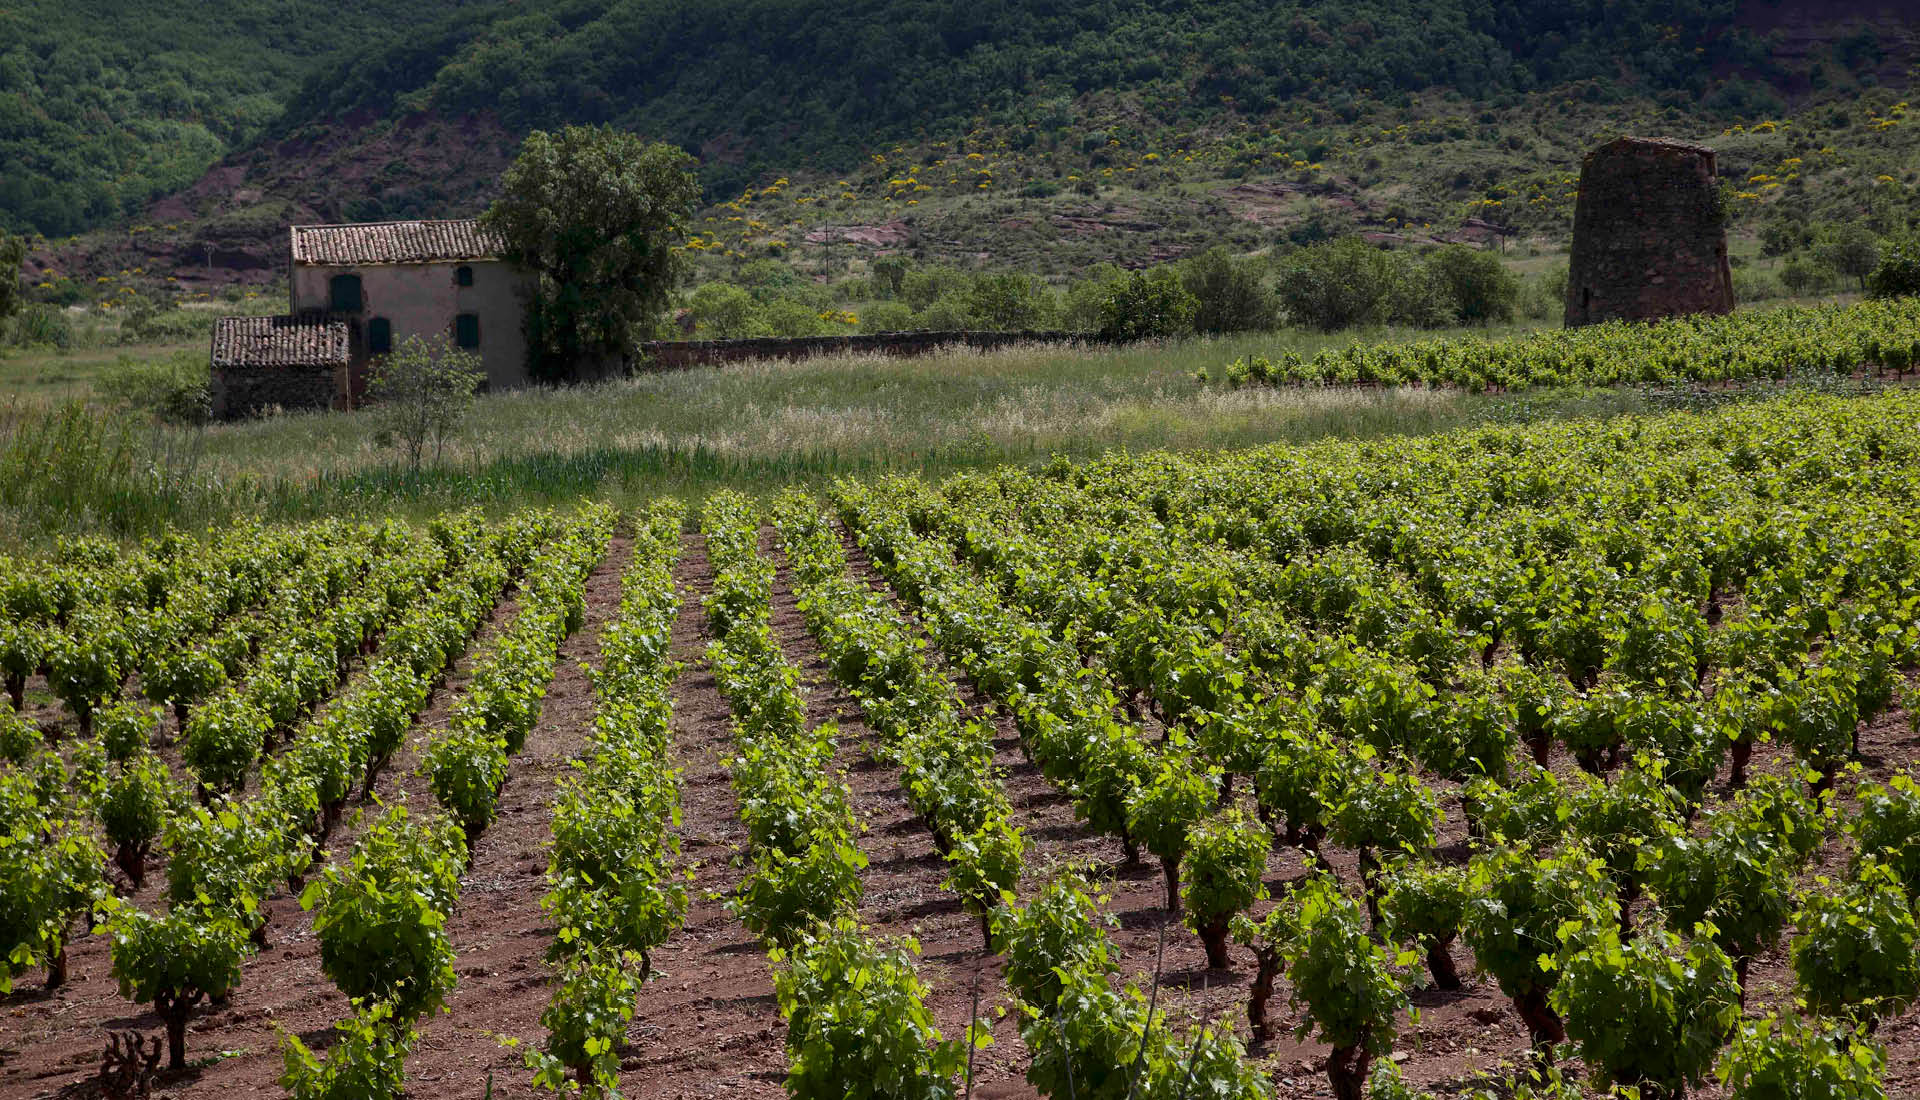 Cultures viticoles Grand Site Salagou © L.Micola 3